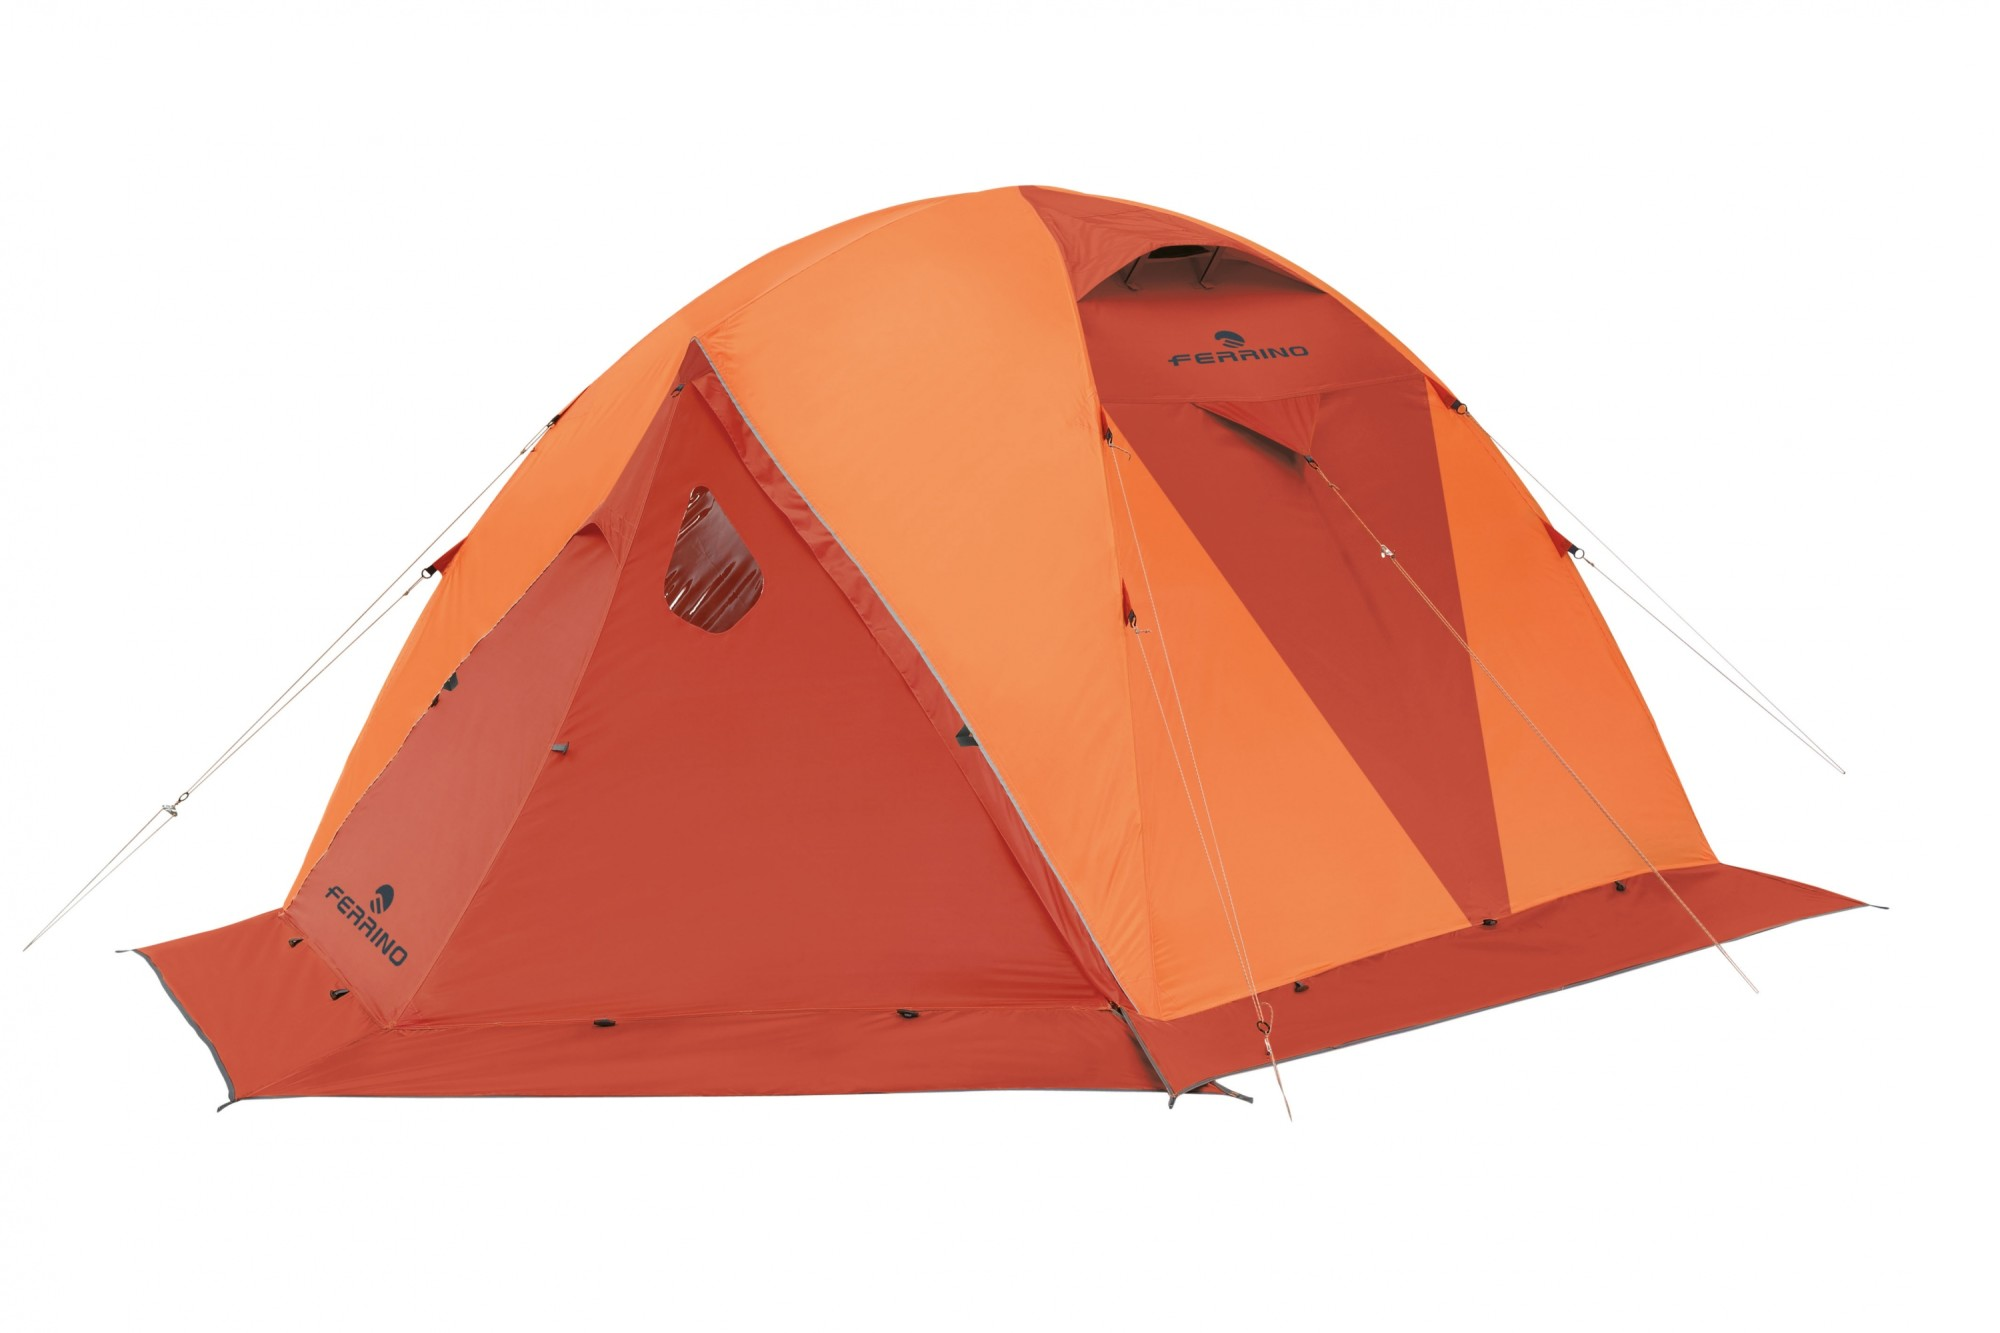 Lhotse 4 tent